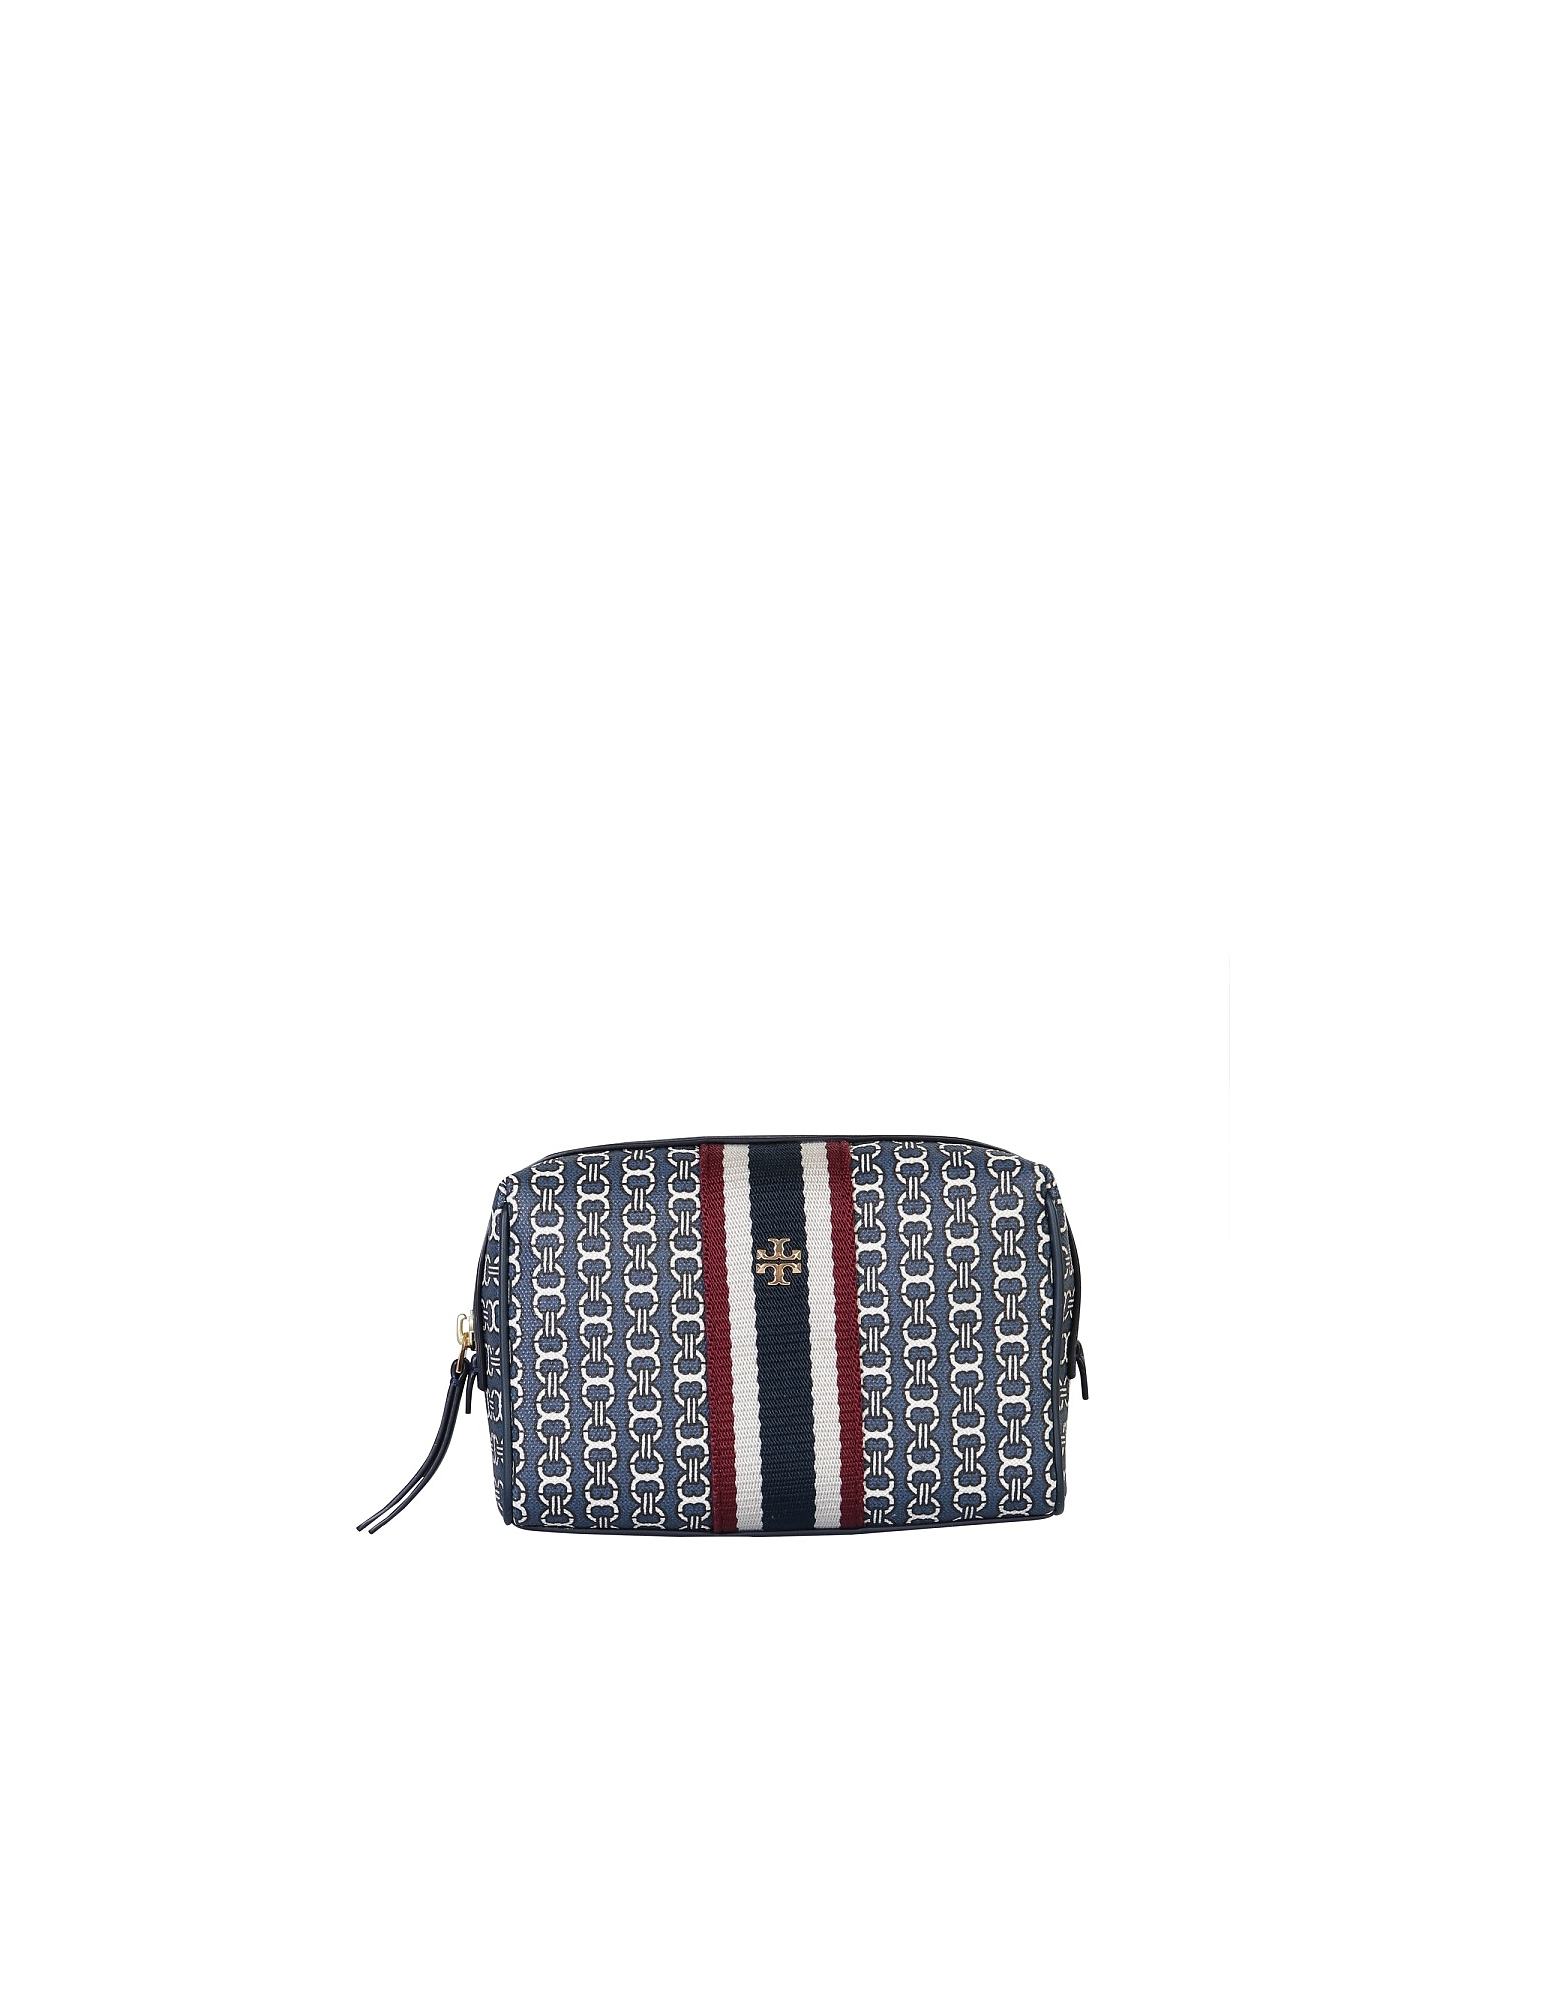 Tory Burch Designer Travel Bags, Gemini Link Beauty Case